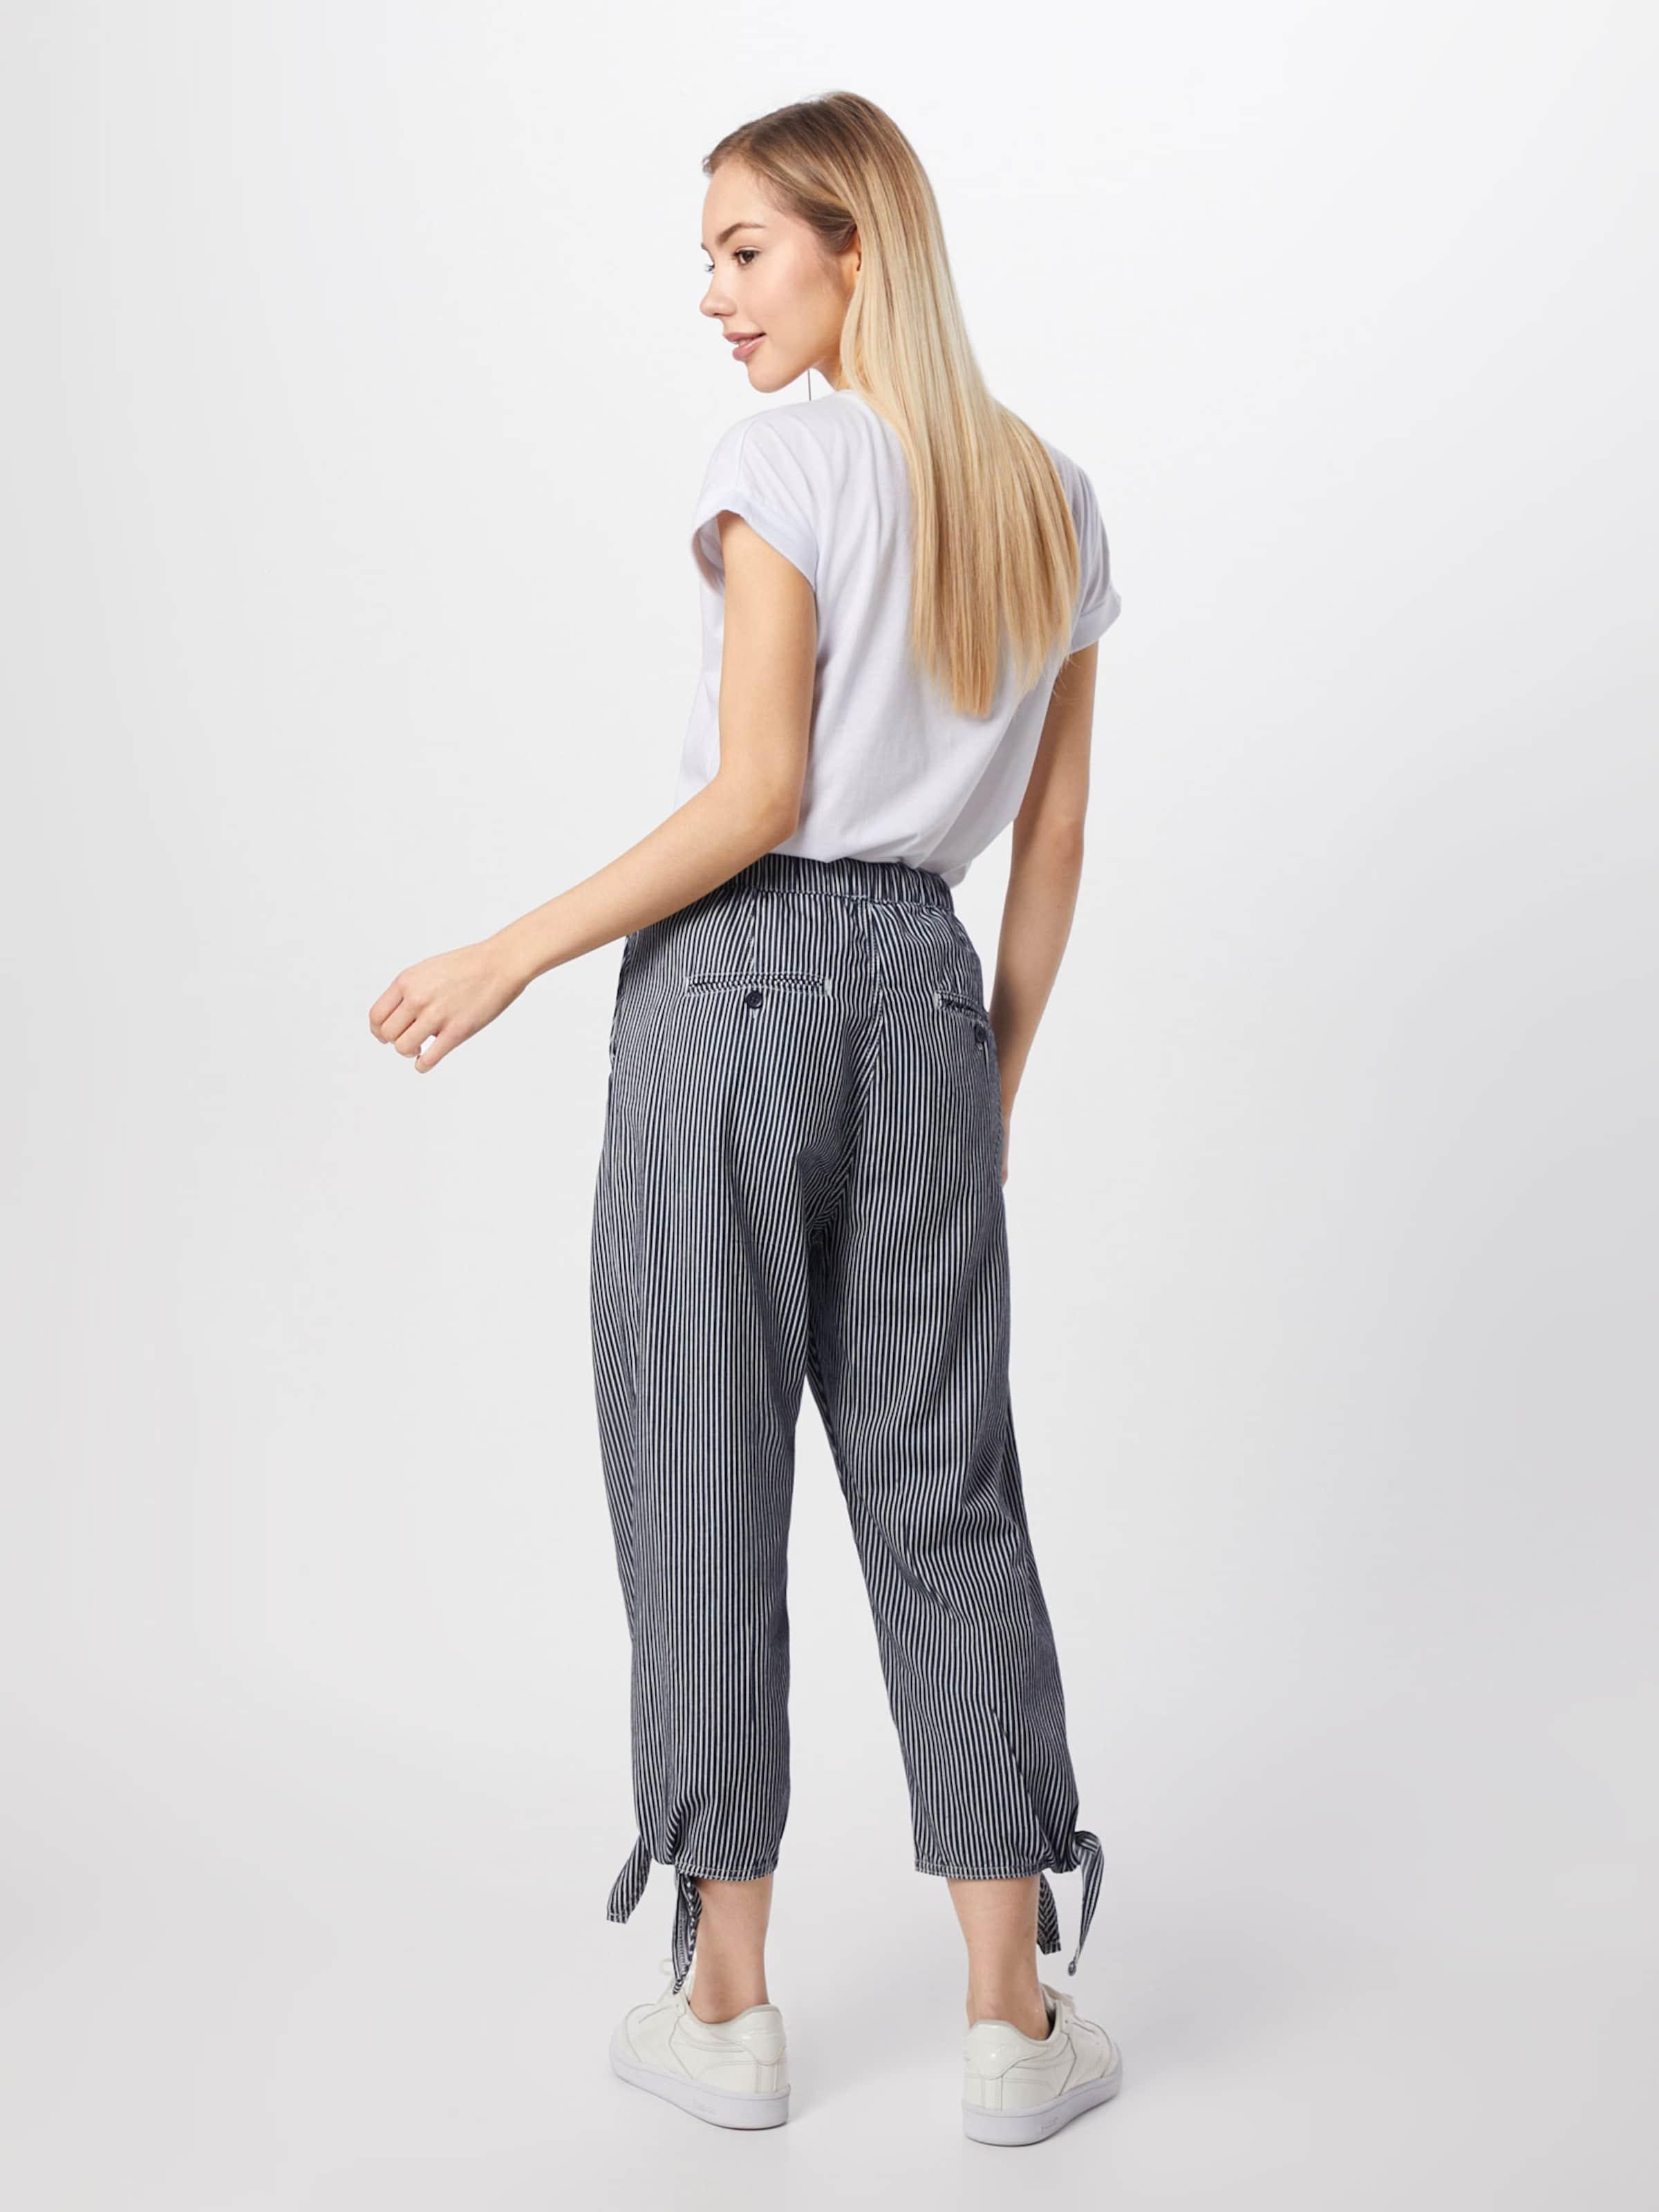 Pepe 'deena' NoirBlanc Pantalon Jeans En clJ3TFK1